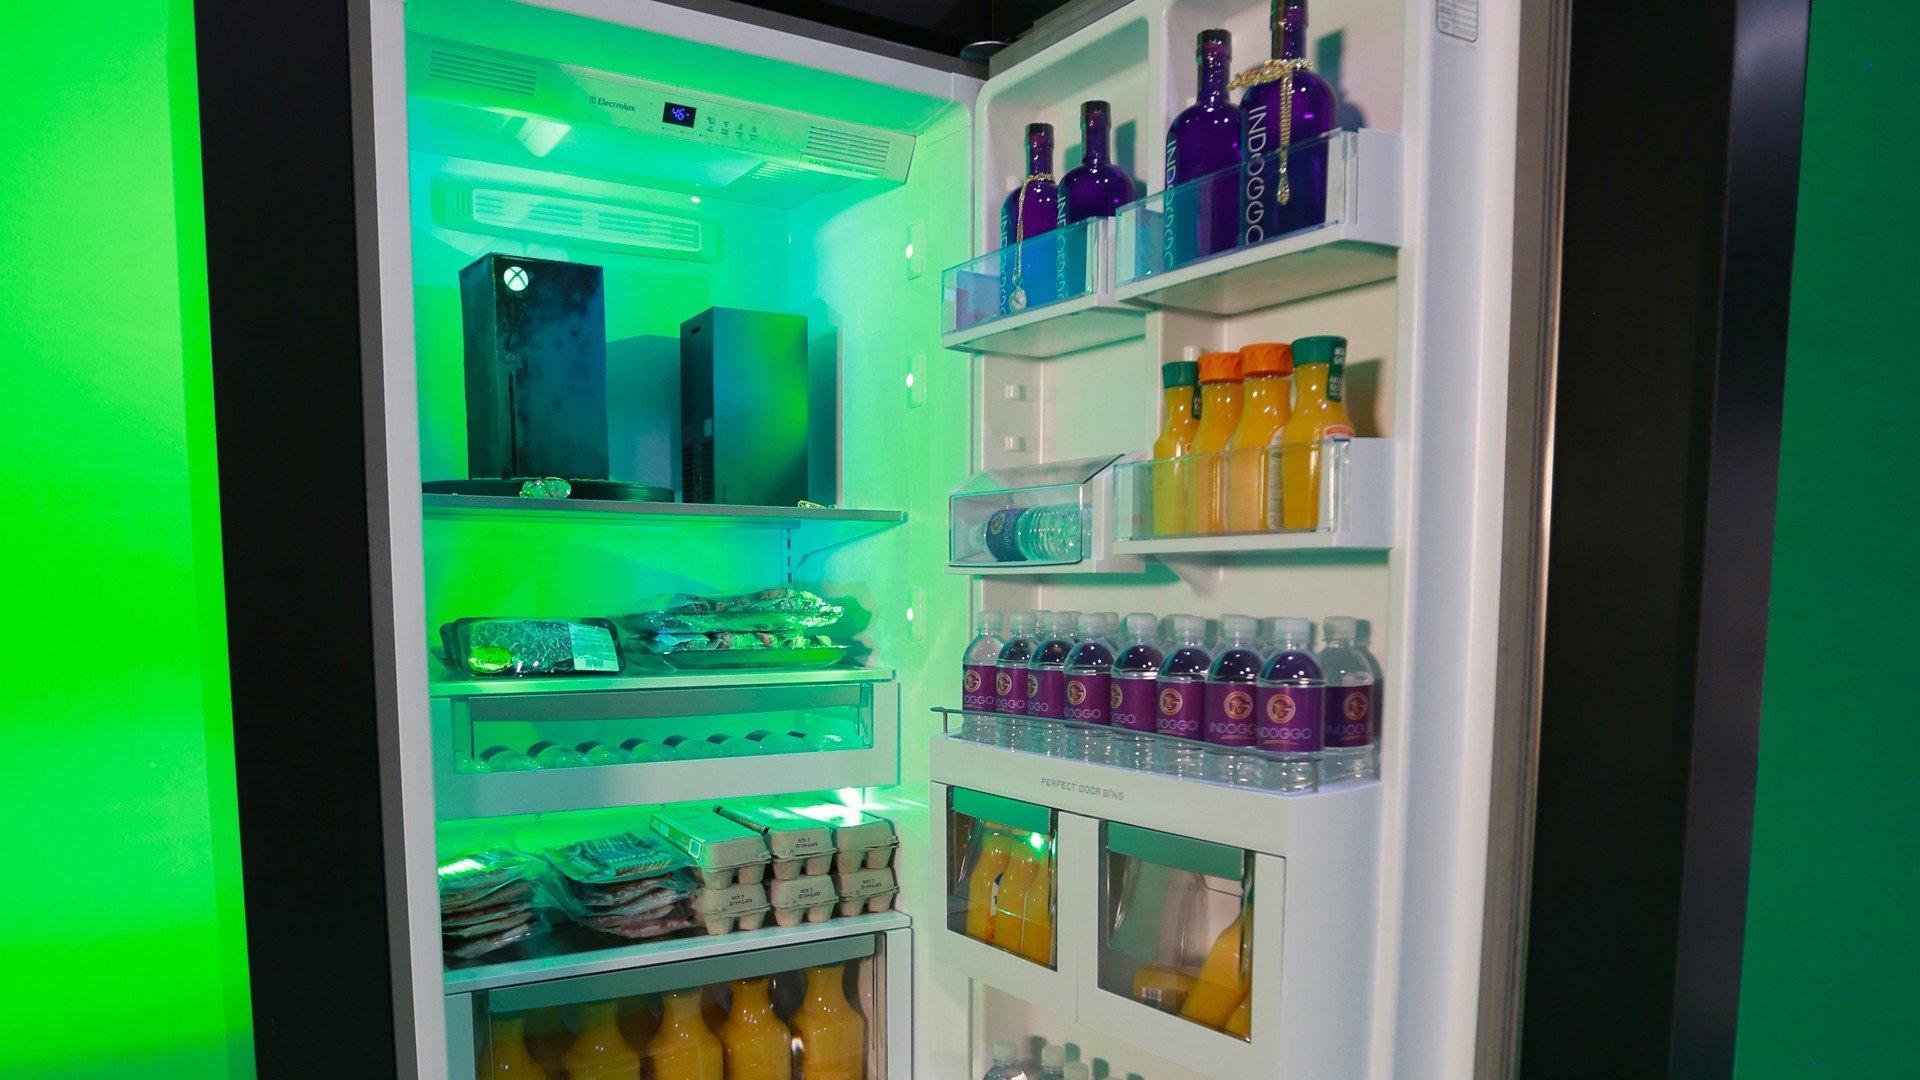 Microsoft made an Xbox Series X fridge 13